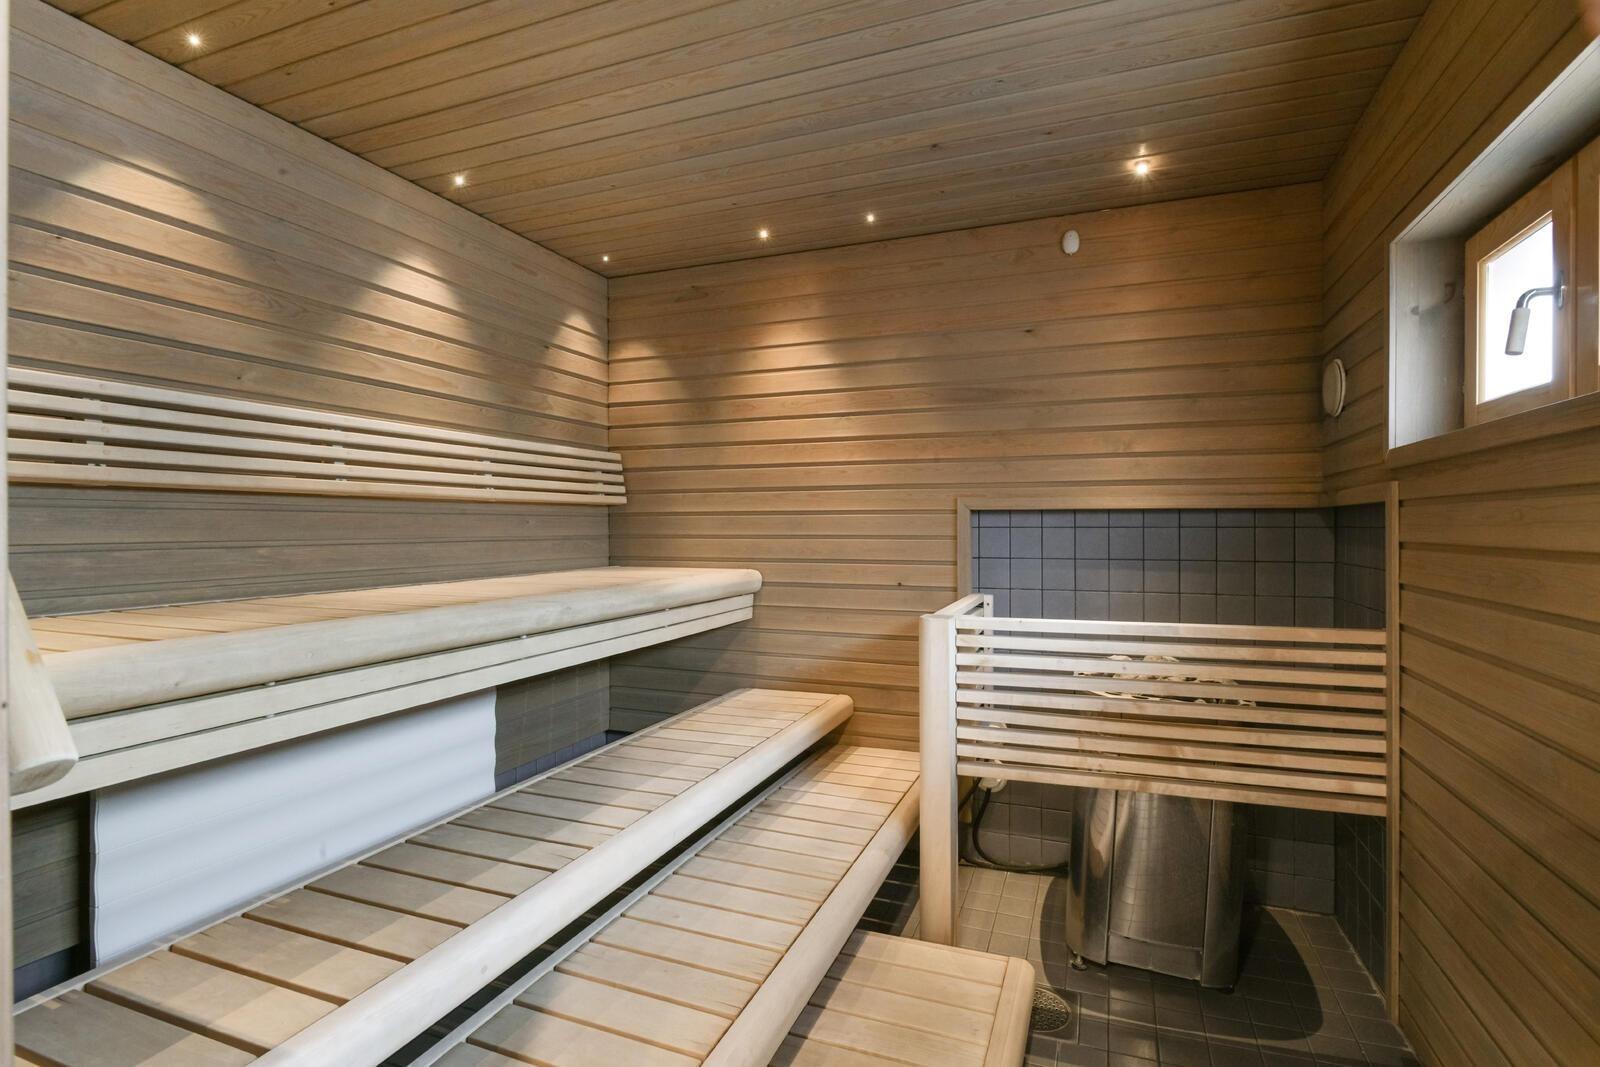 Taloyhtiön saunatila